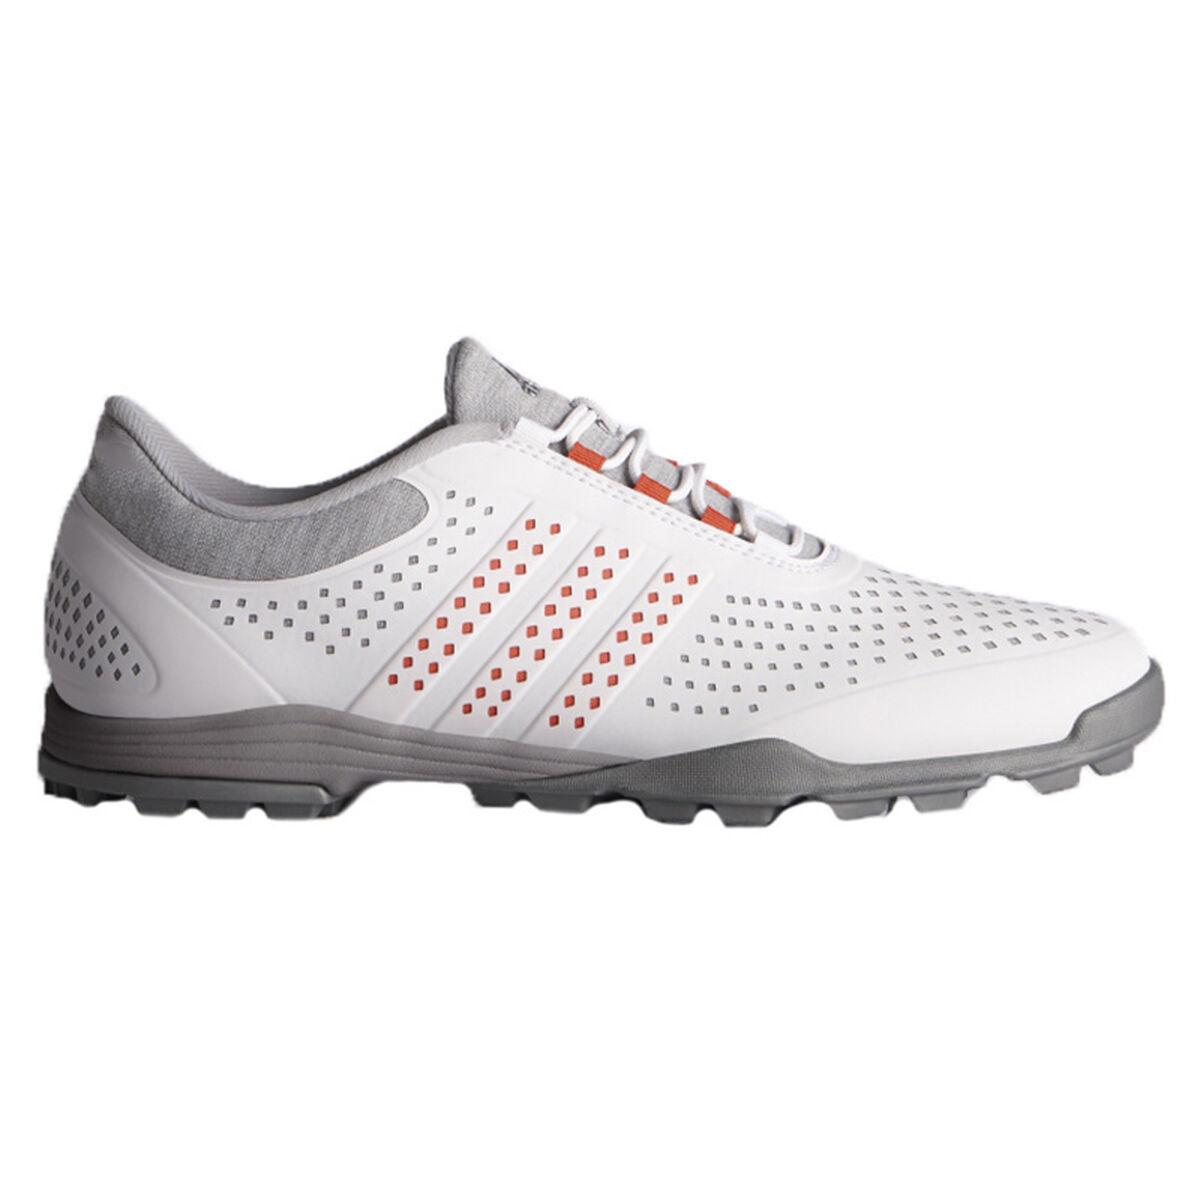 separation shoes 36957 0c1f5 Images. adidas adiPure Sport ...